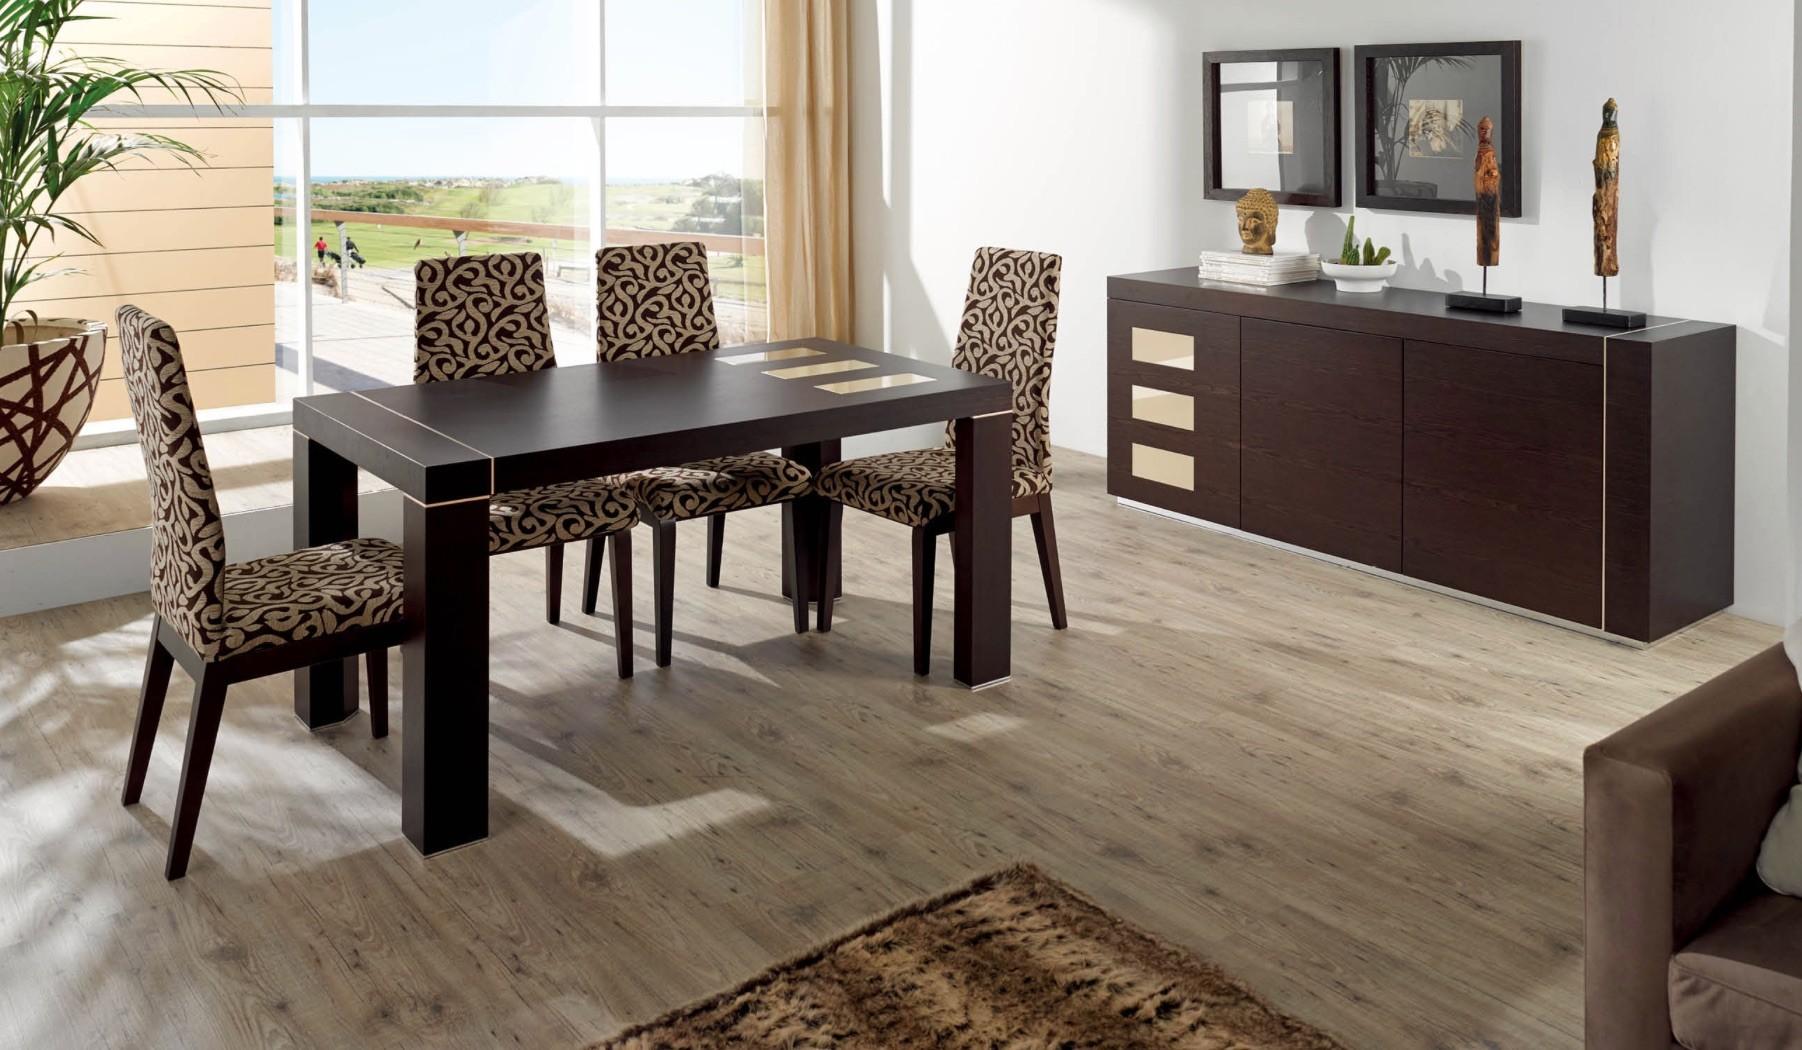 Irene Modern Dining Room Table